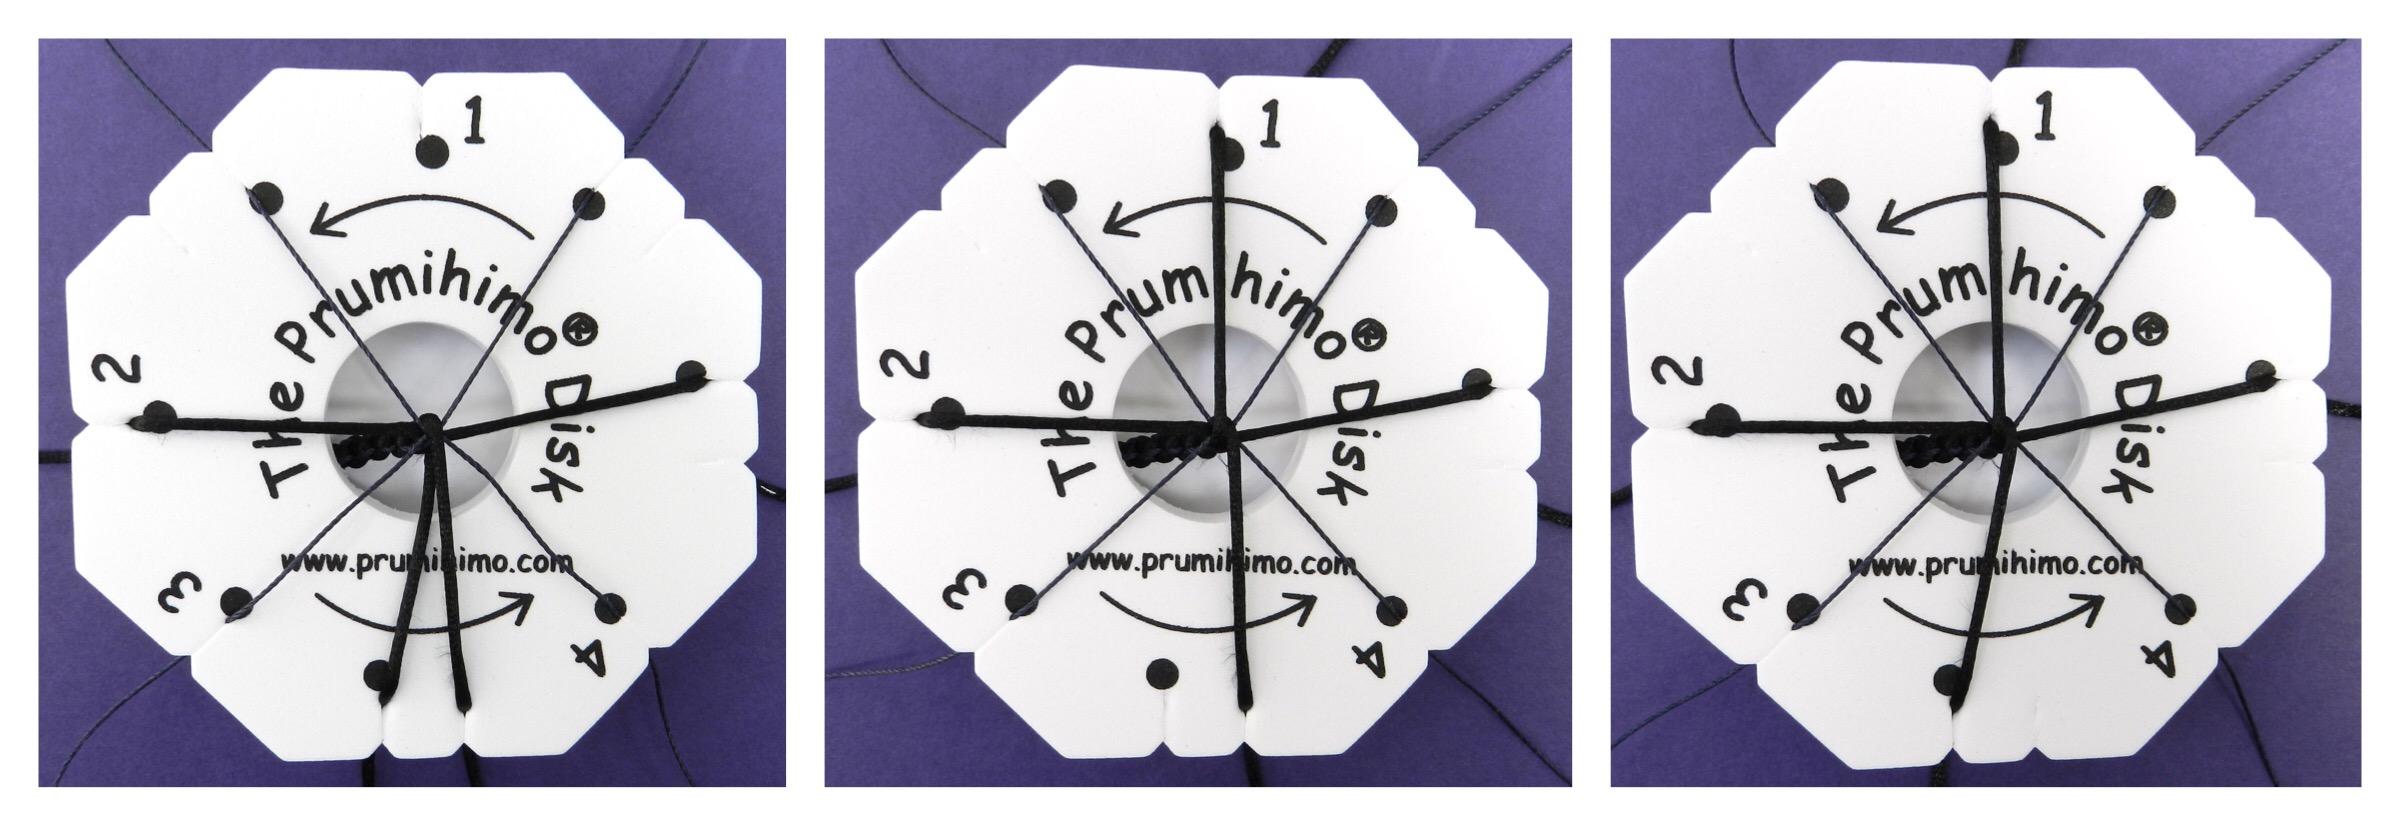 Astonishing Braid Instructions Prumihimo Schematic Wiring Diagrams Amerangerunnerswayorg